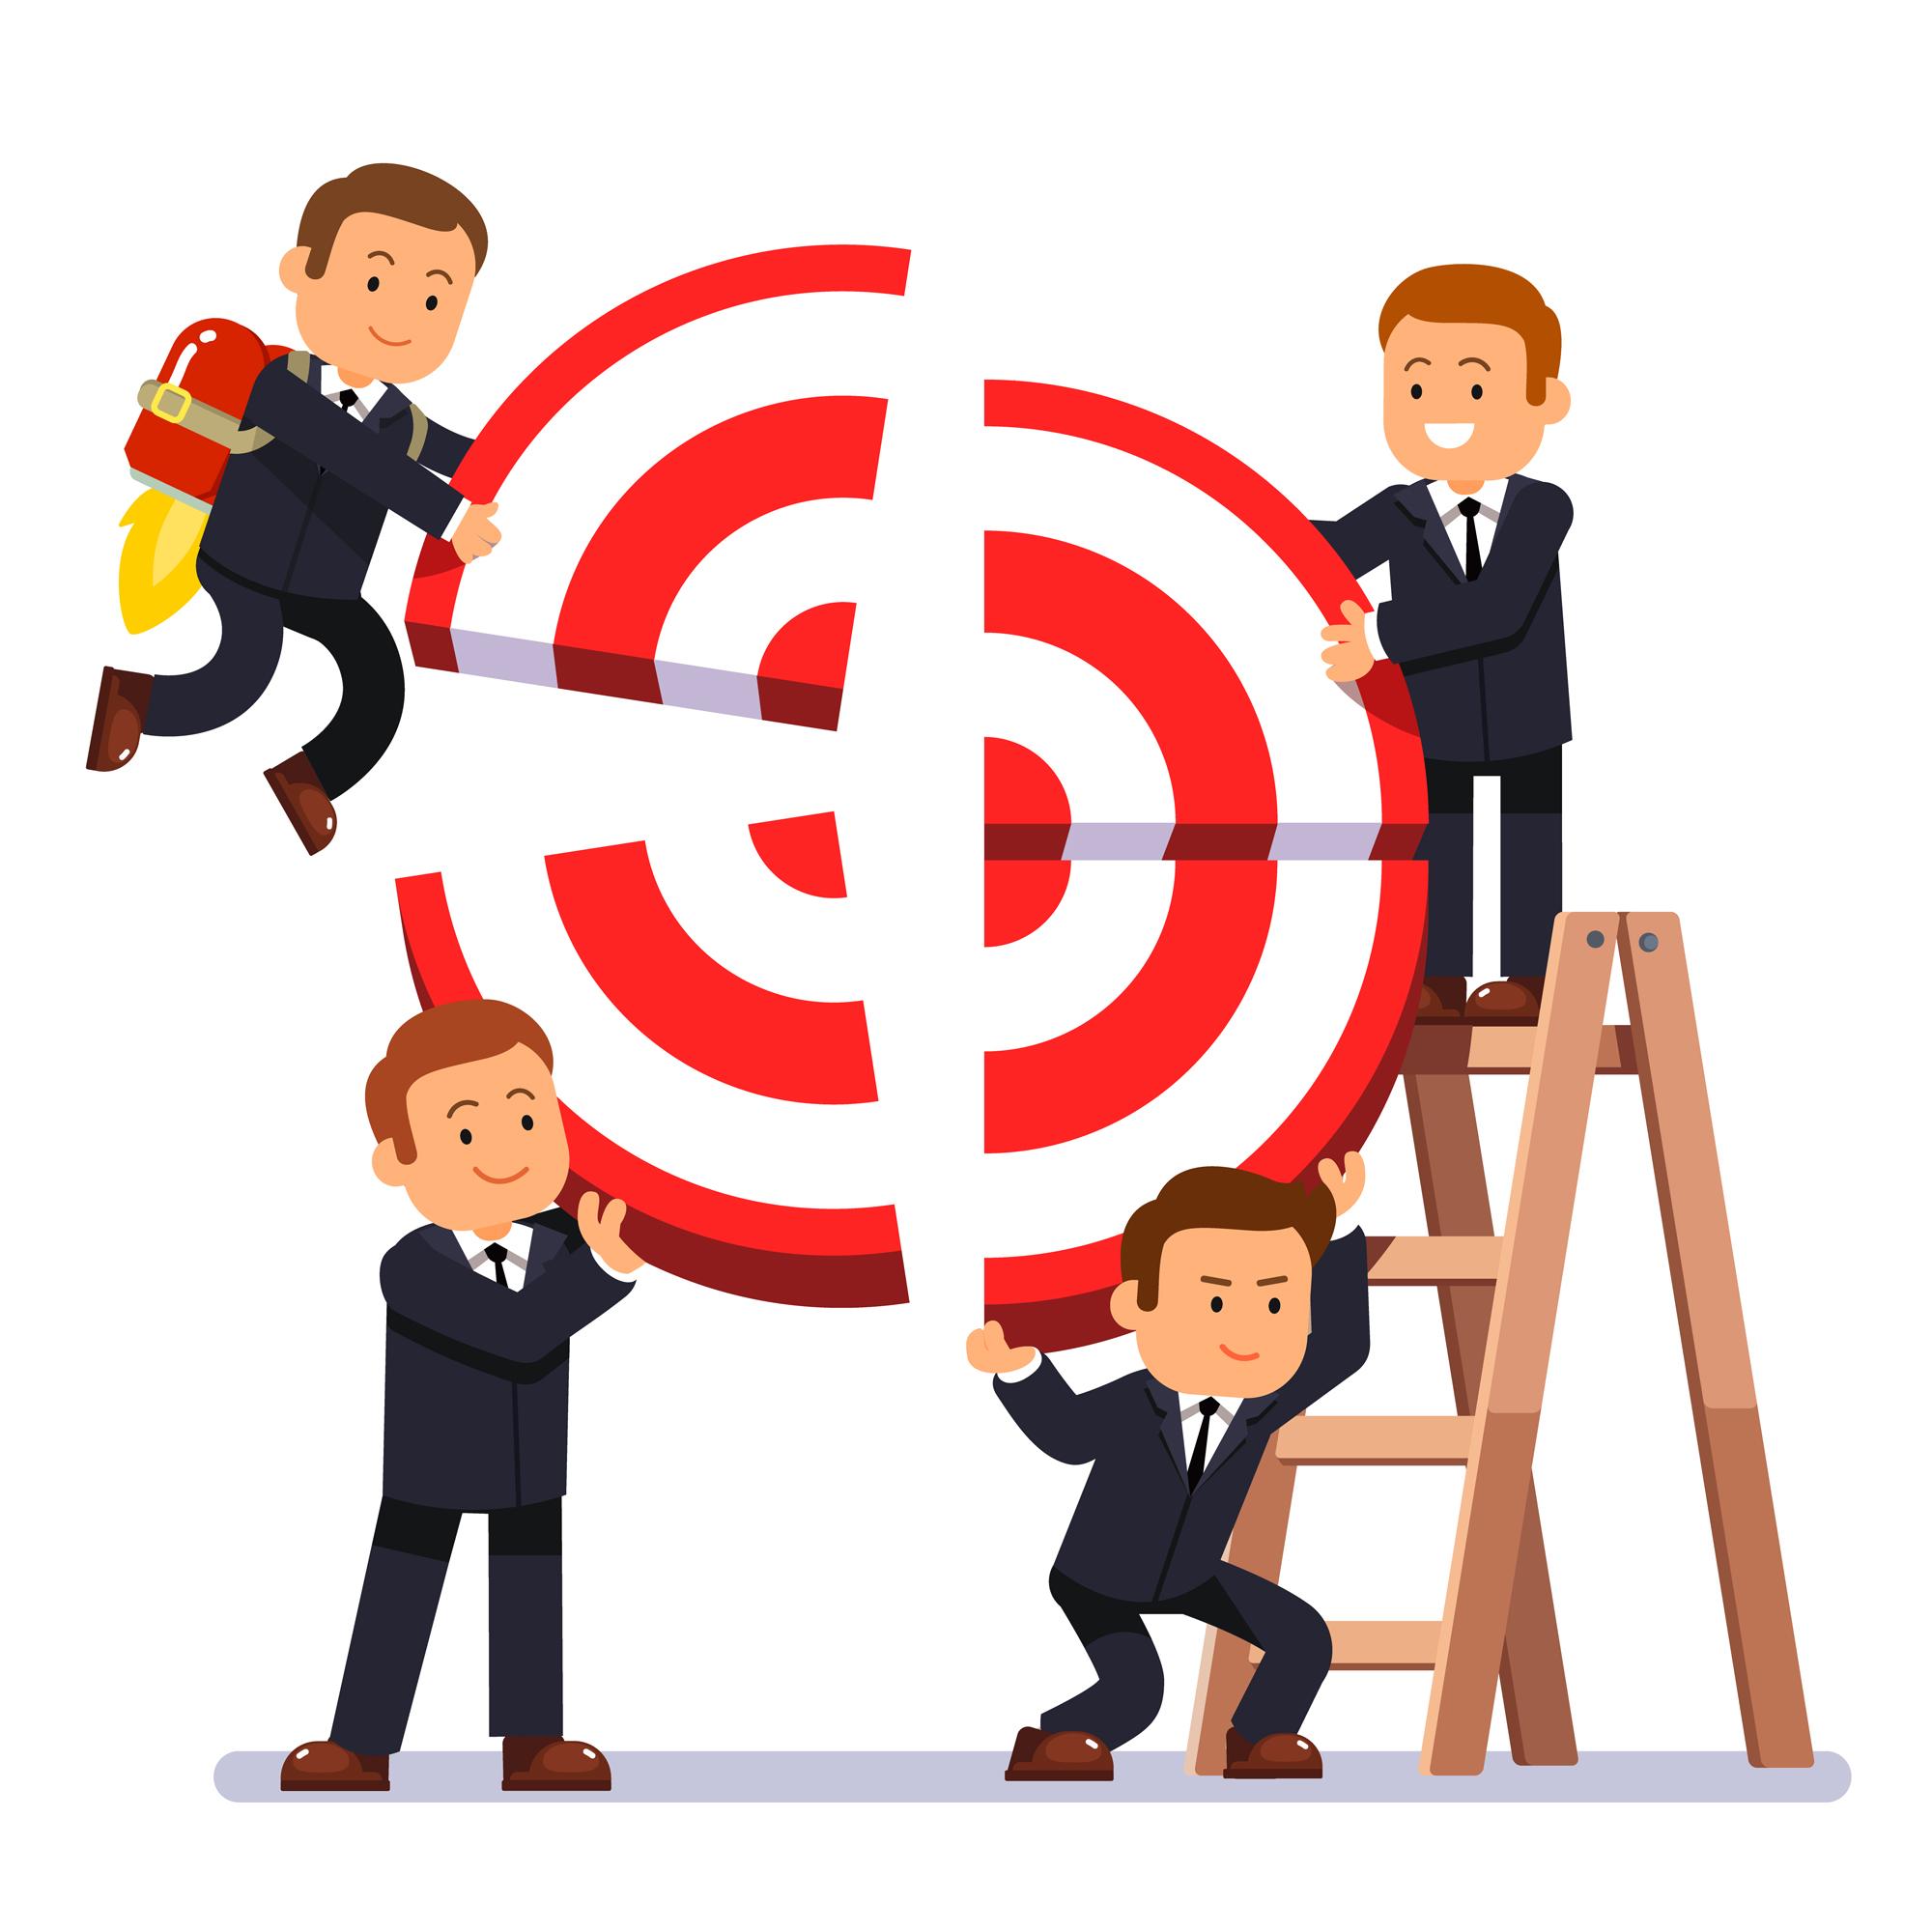 Businessman team building aim